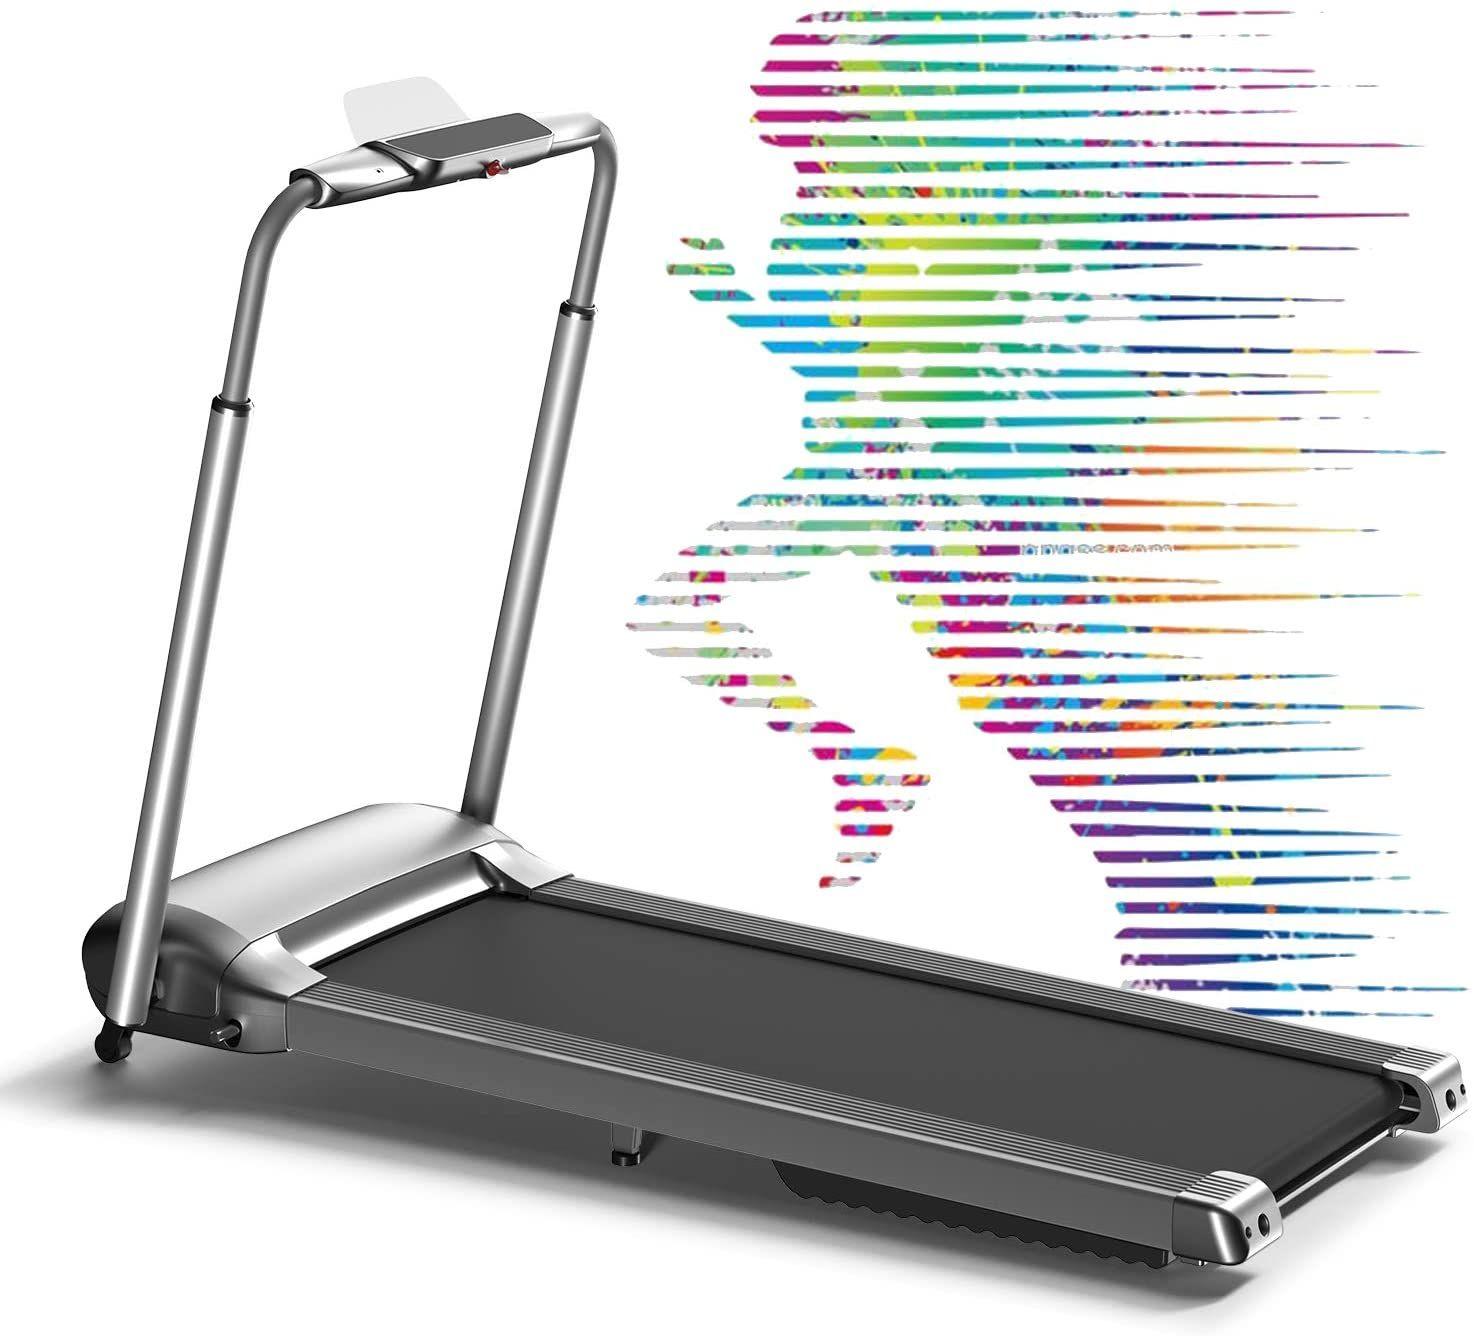 Wekeep Folding Portable Treadmill Manual Compact Walking Running Machine Workout Electric Desk Treadmills For Small Portable Treadmill Electric Desk Treadmill